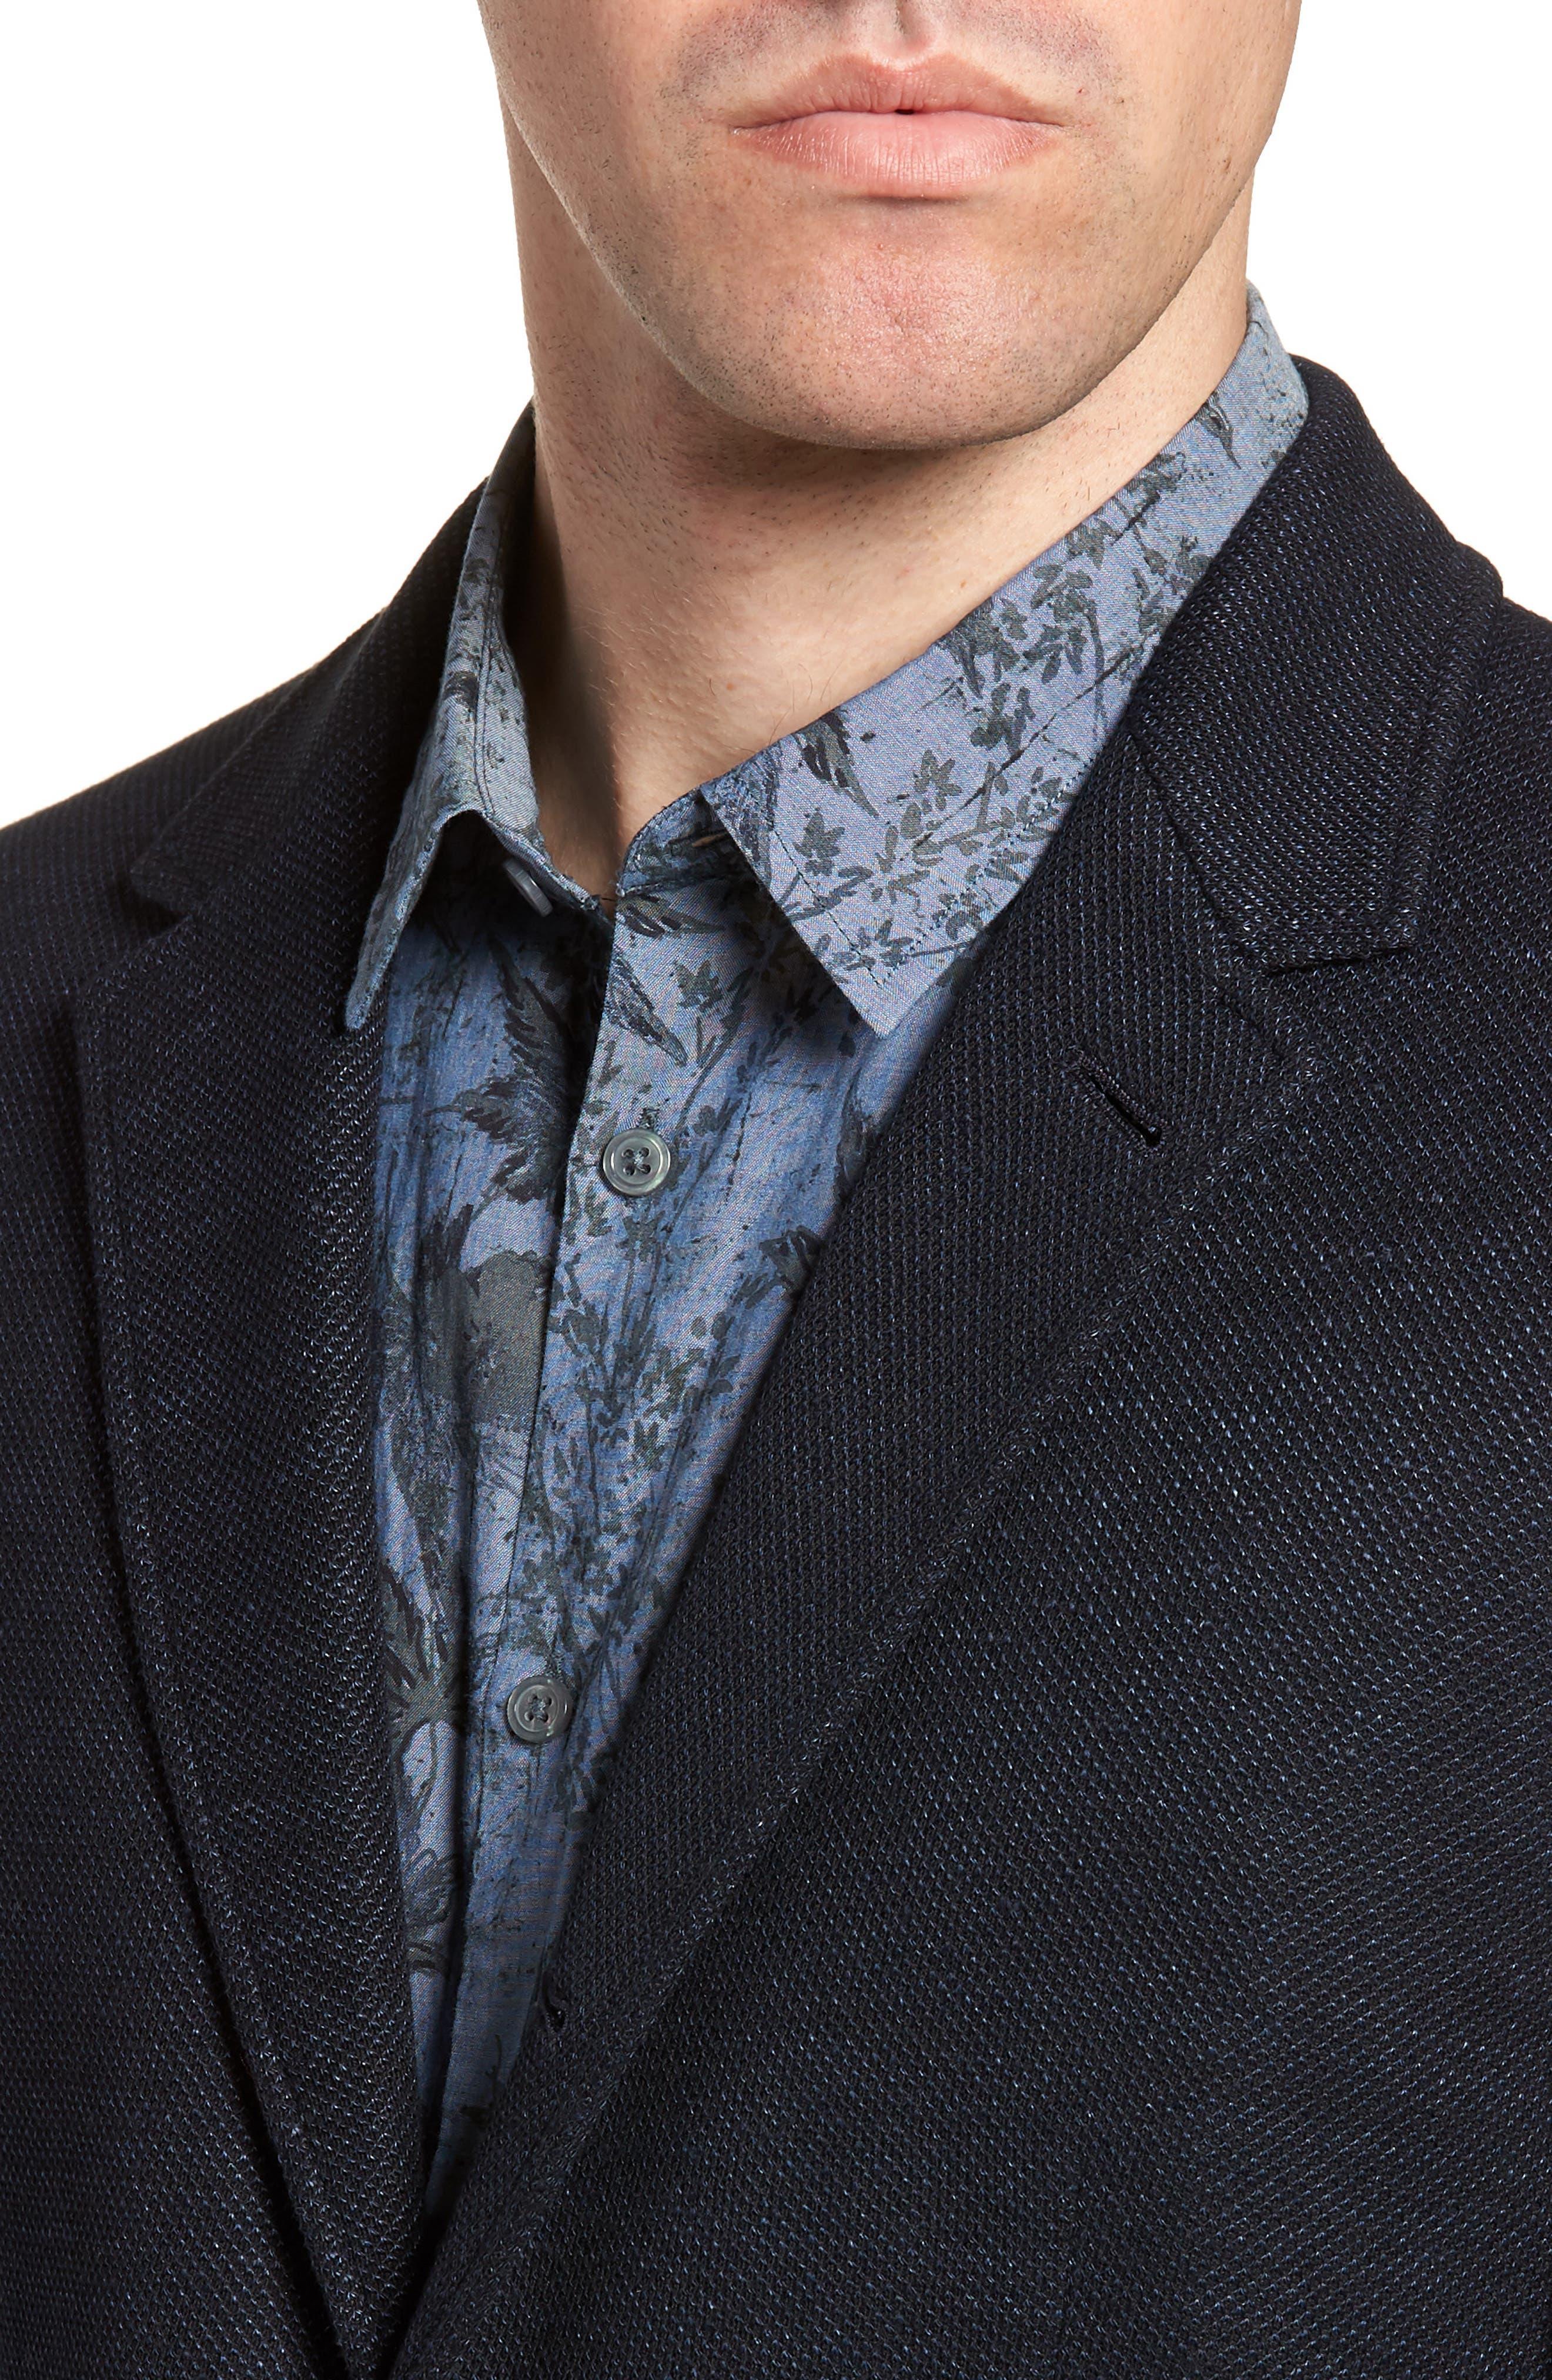 Regular Fit Cotton & Linen Blazer,                             Alternate thumbnail 4, color,                             405